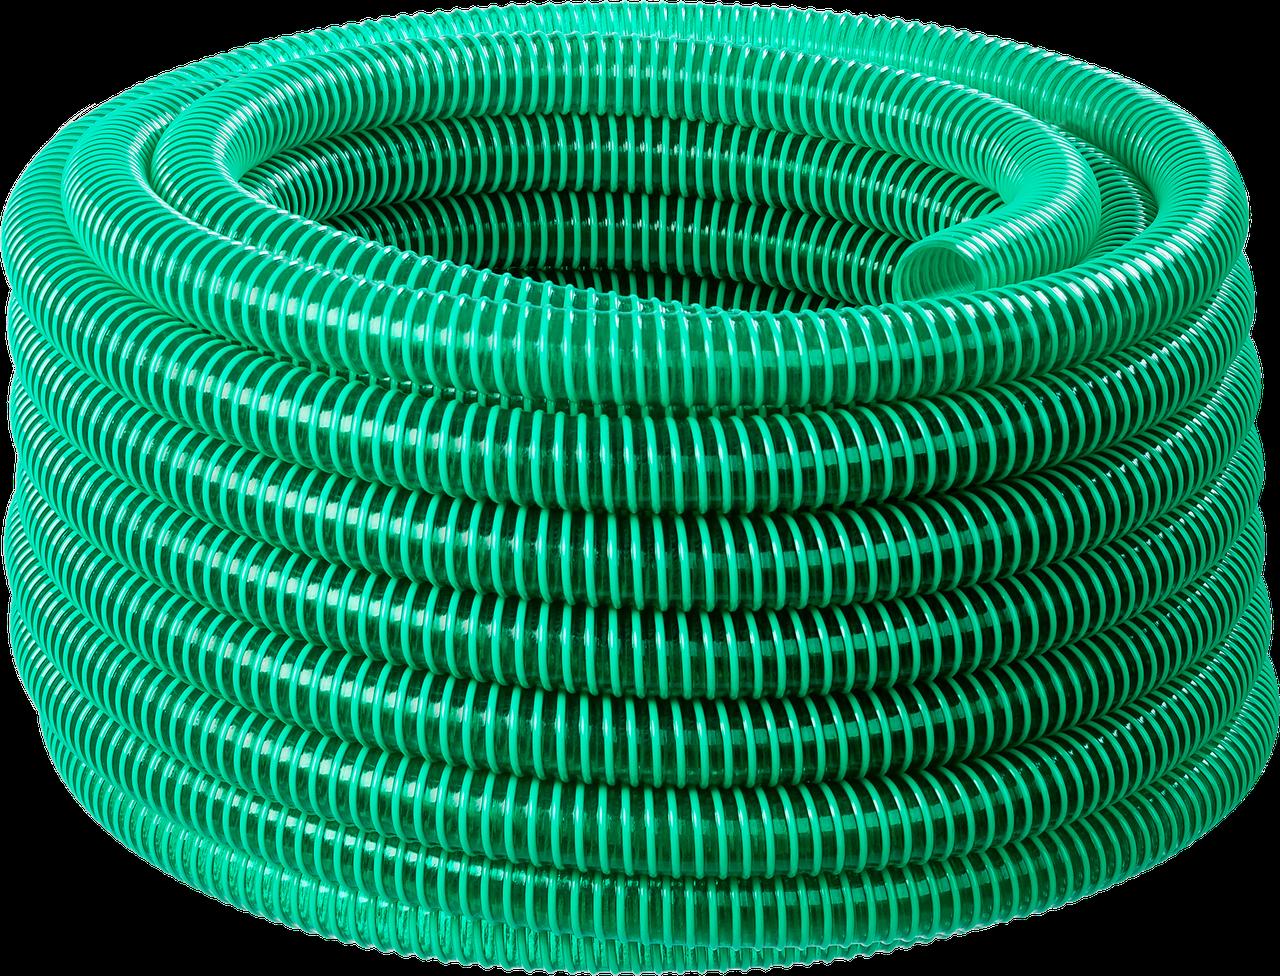 ЗУБР Шланг напорно-всасывающий со спиралью ПВХ, 3 атм, 19мм х 15м 240, 32, 15